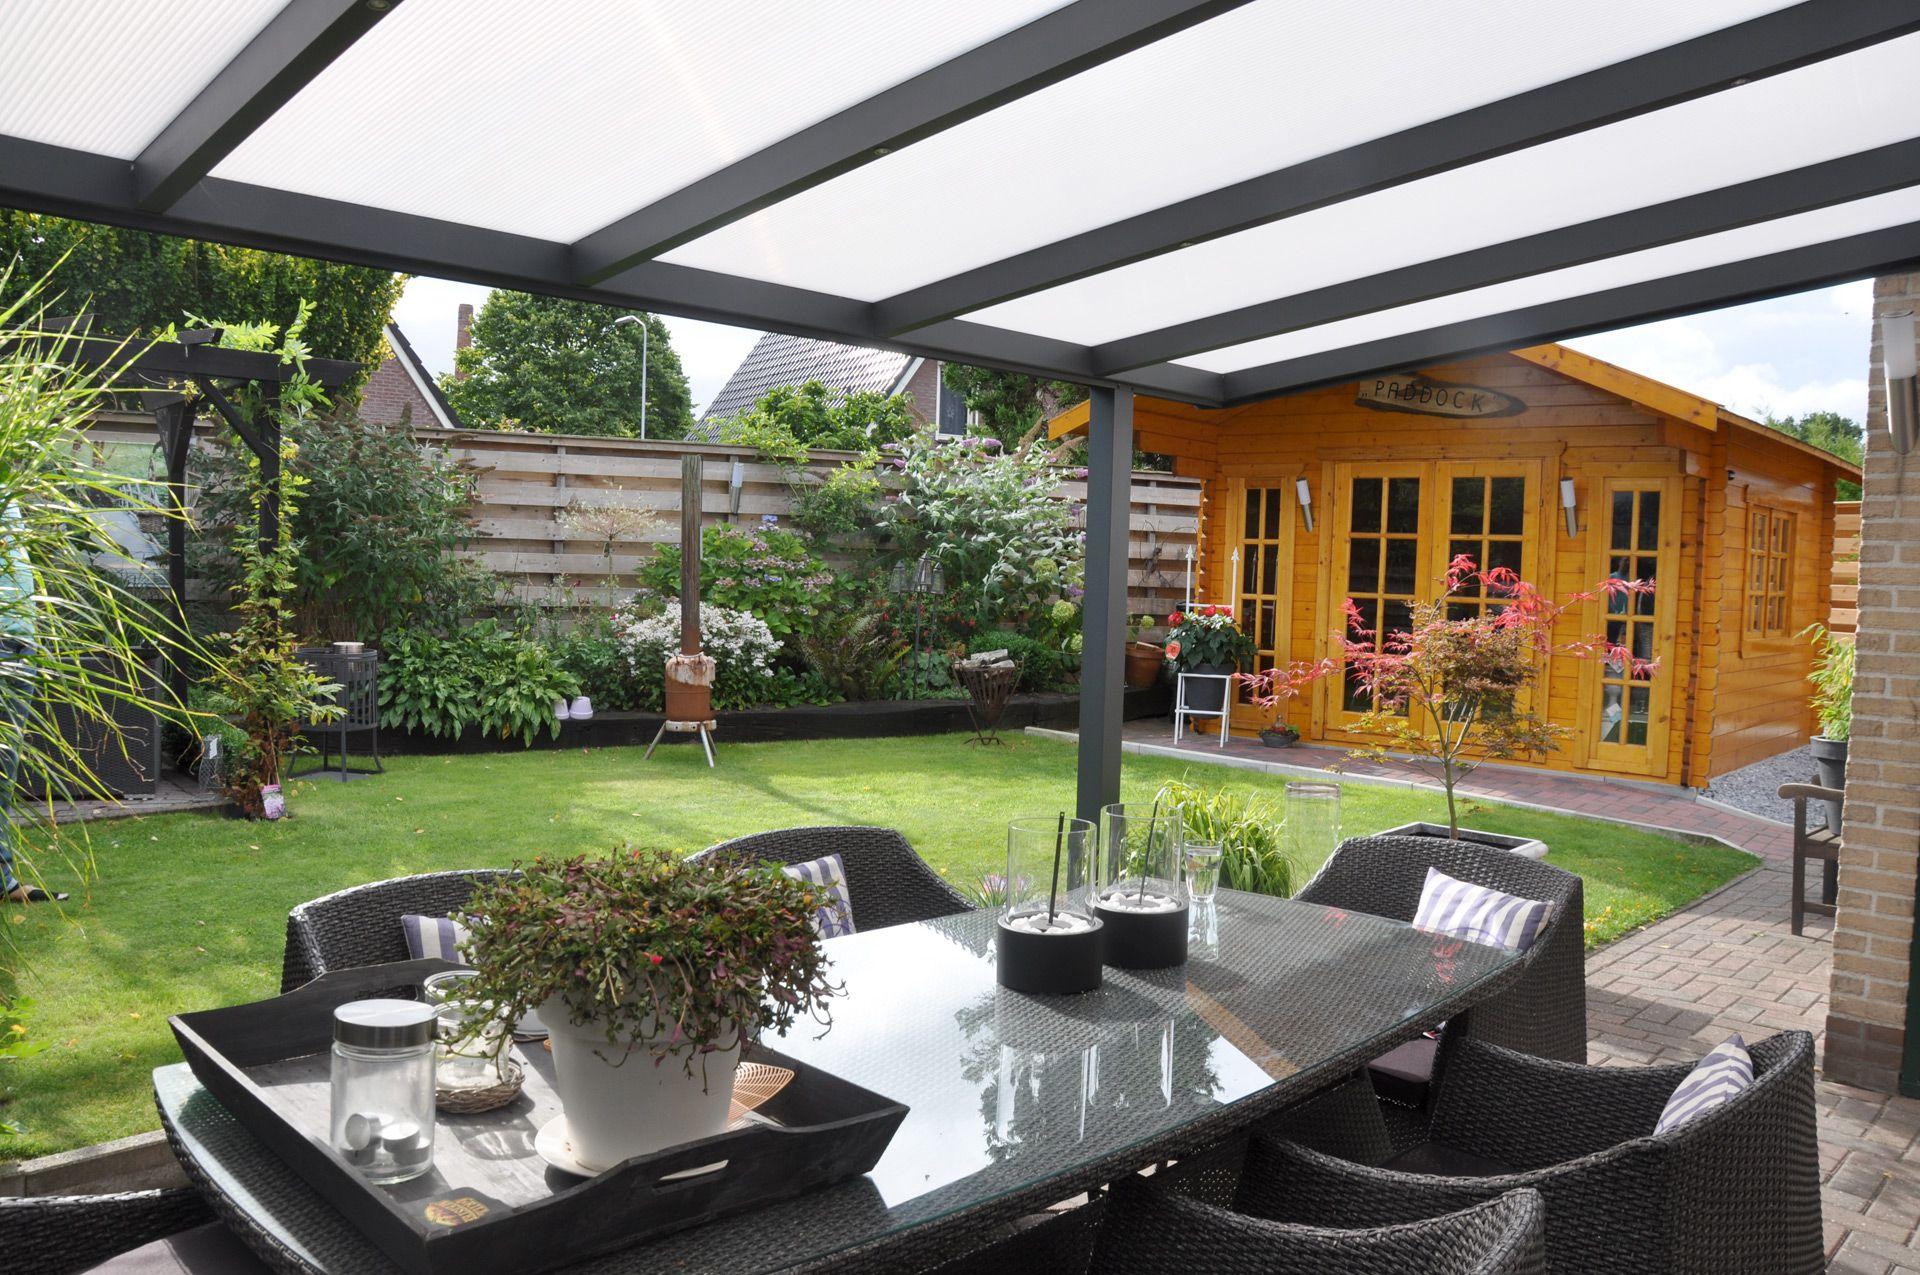 terrassendach aluminium ueberdachungen polycarbonat 3 m. Black Bedroom Furniture Sets. Home Design Ideas